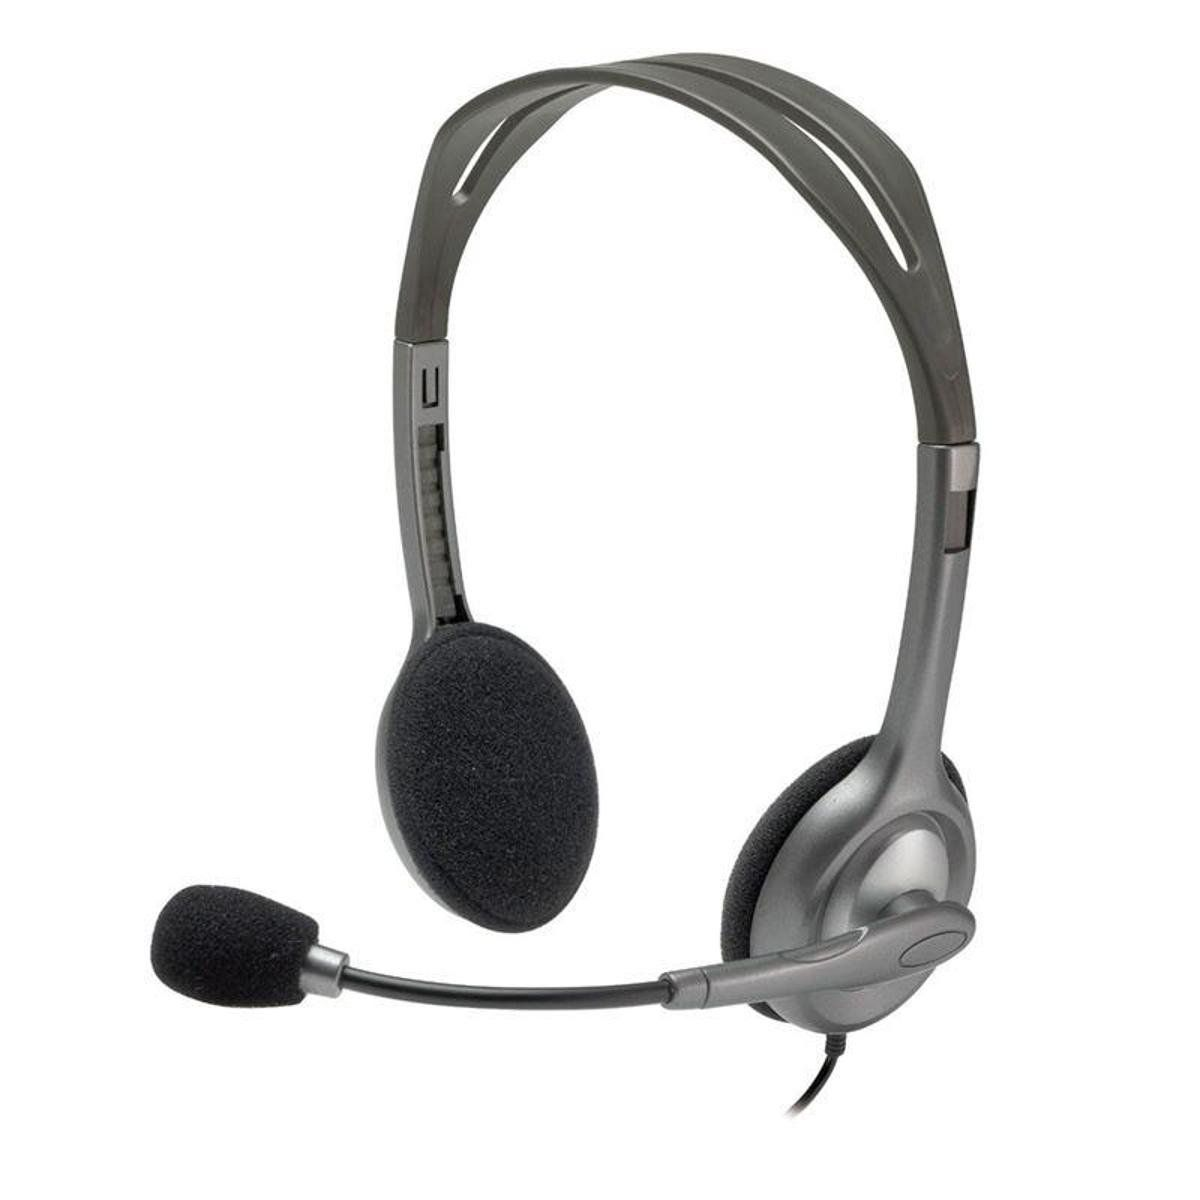 Headset Logitech H111 Estéreo Analógico P3 3,5 mm Cinza